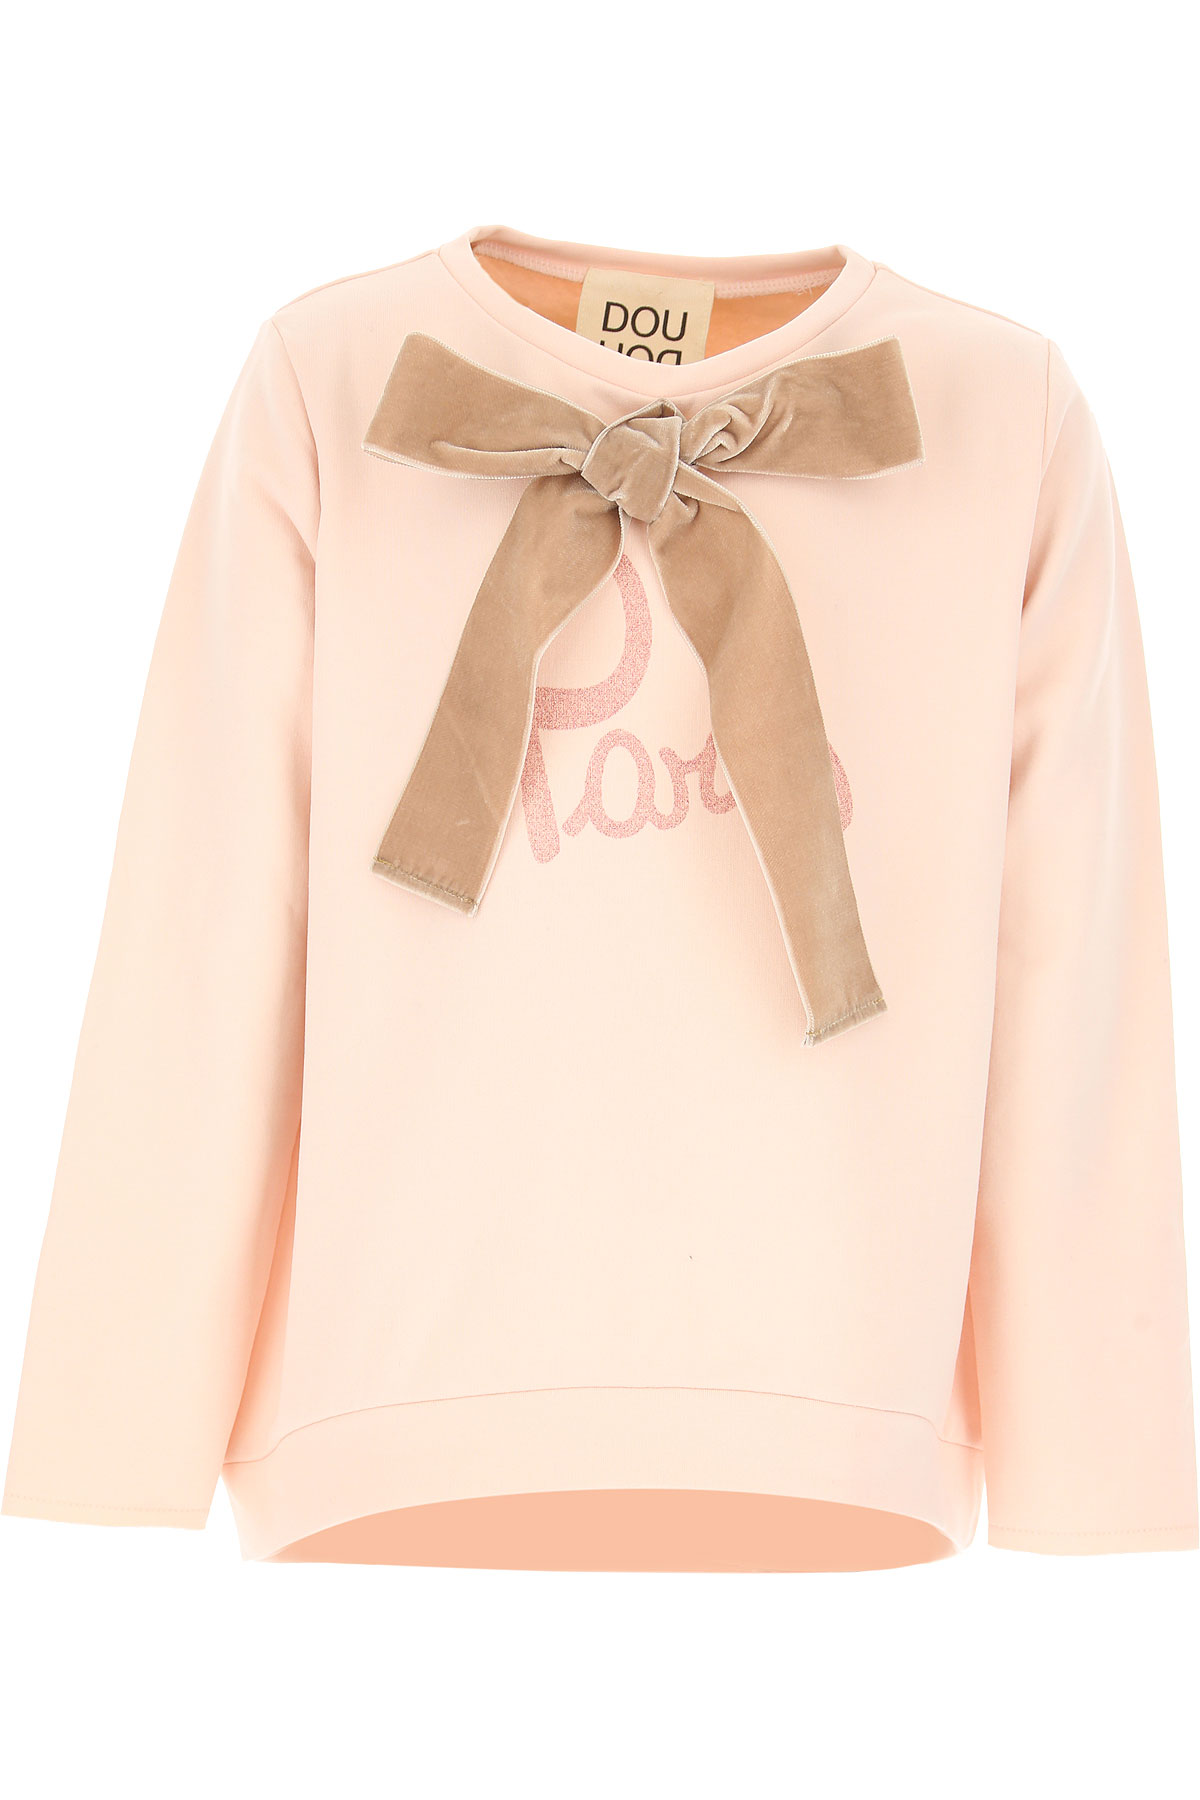 Image of Douuod Kids Sweatshirts & Hoodies for Girls, Pink, Cotton, 2017, 10Y 14Y 2Y 4Y 6Y 8Y